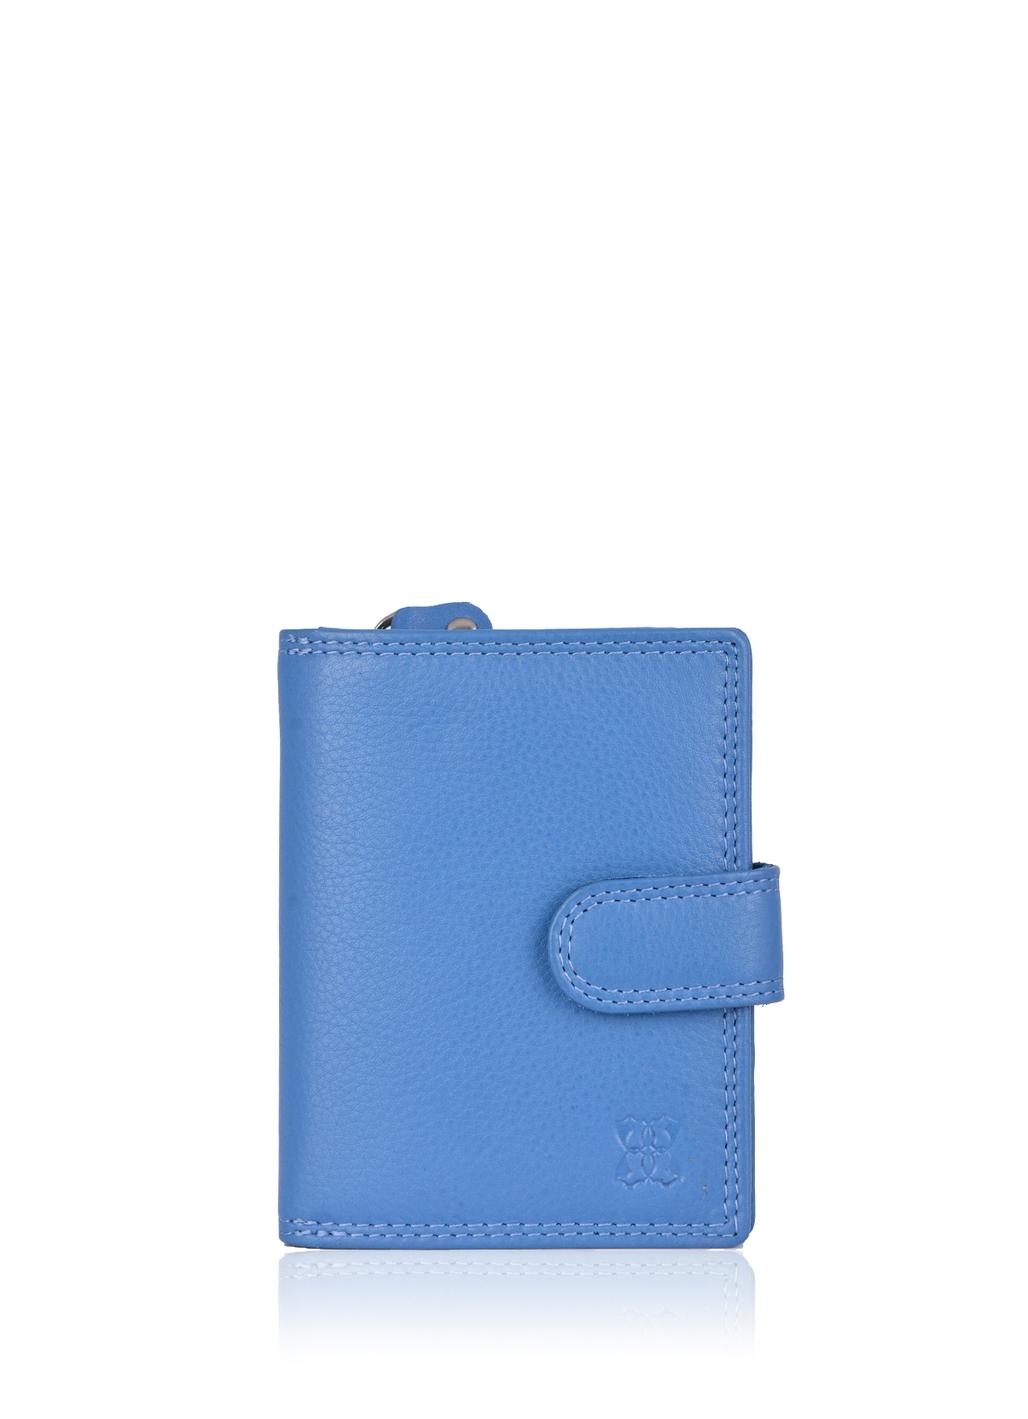 11.5cm Leather Tab Purse in Blue